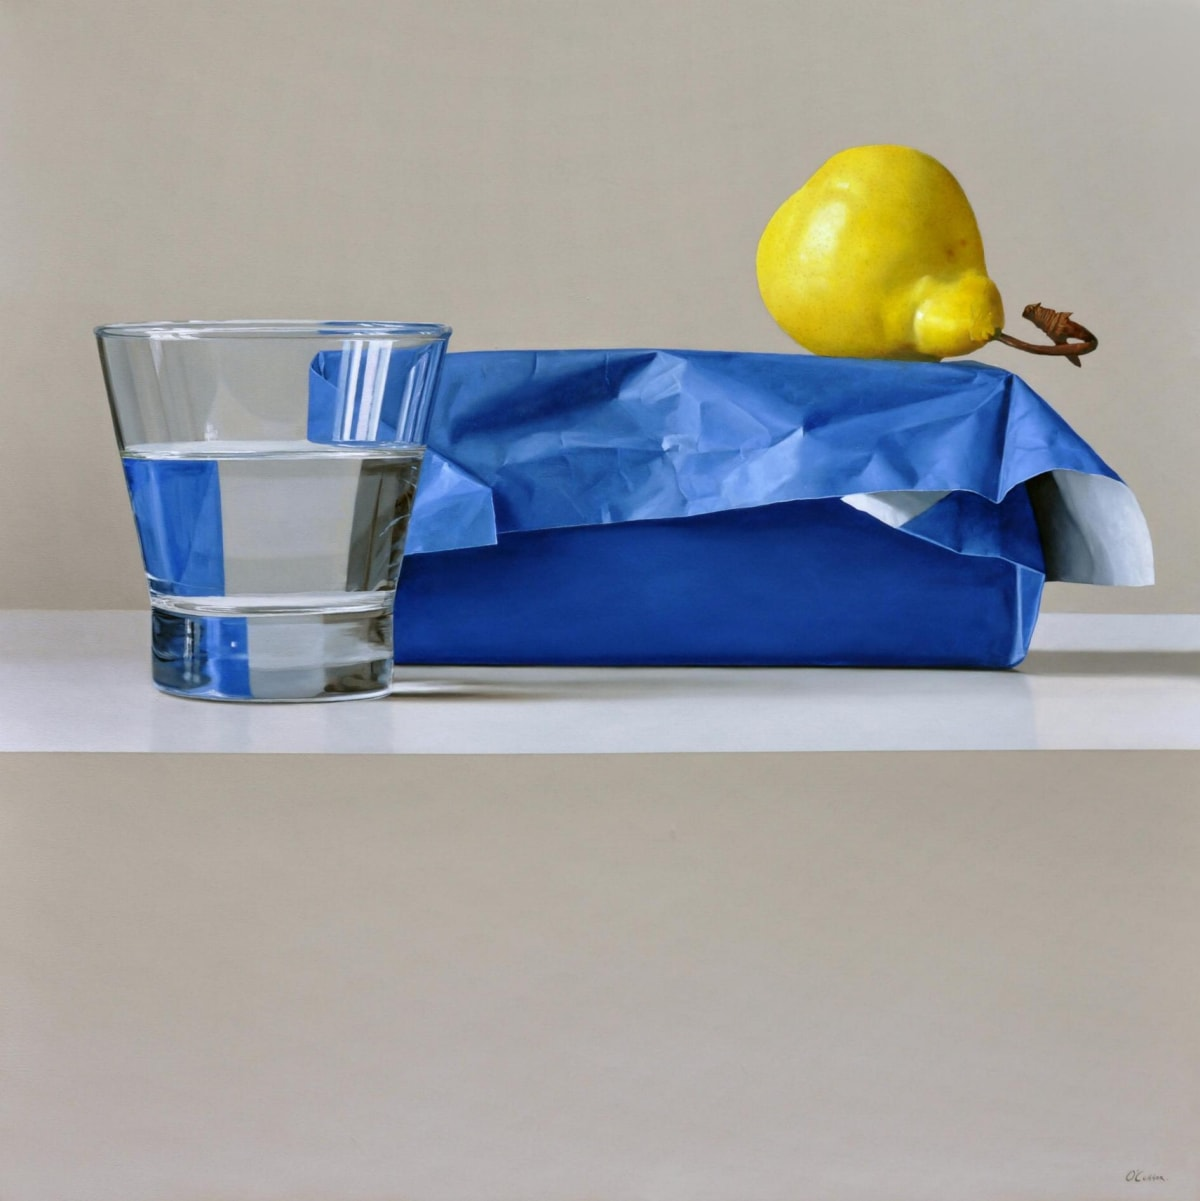 Fernando O'Connor Glass and Pear oil on canvas 120 x 120 cm